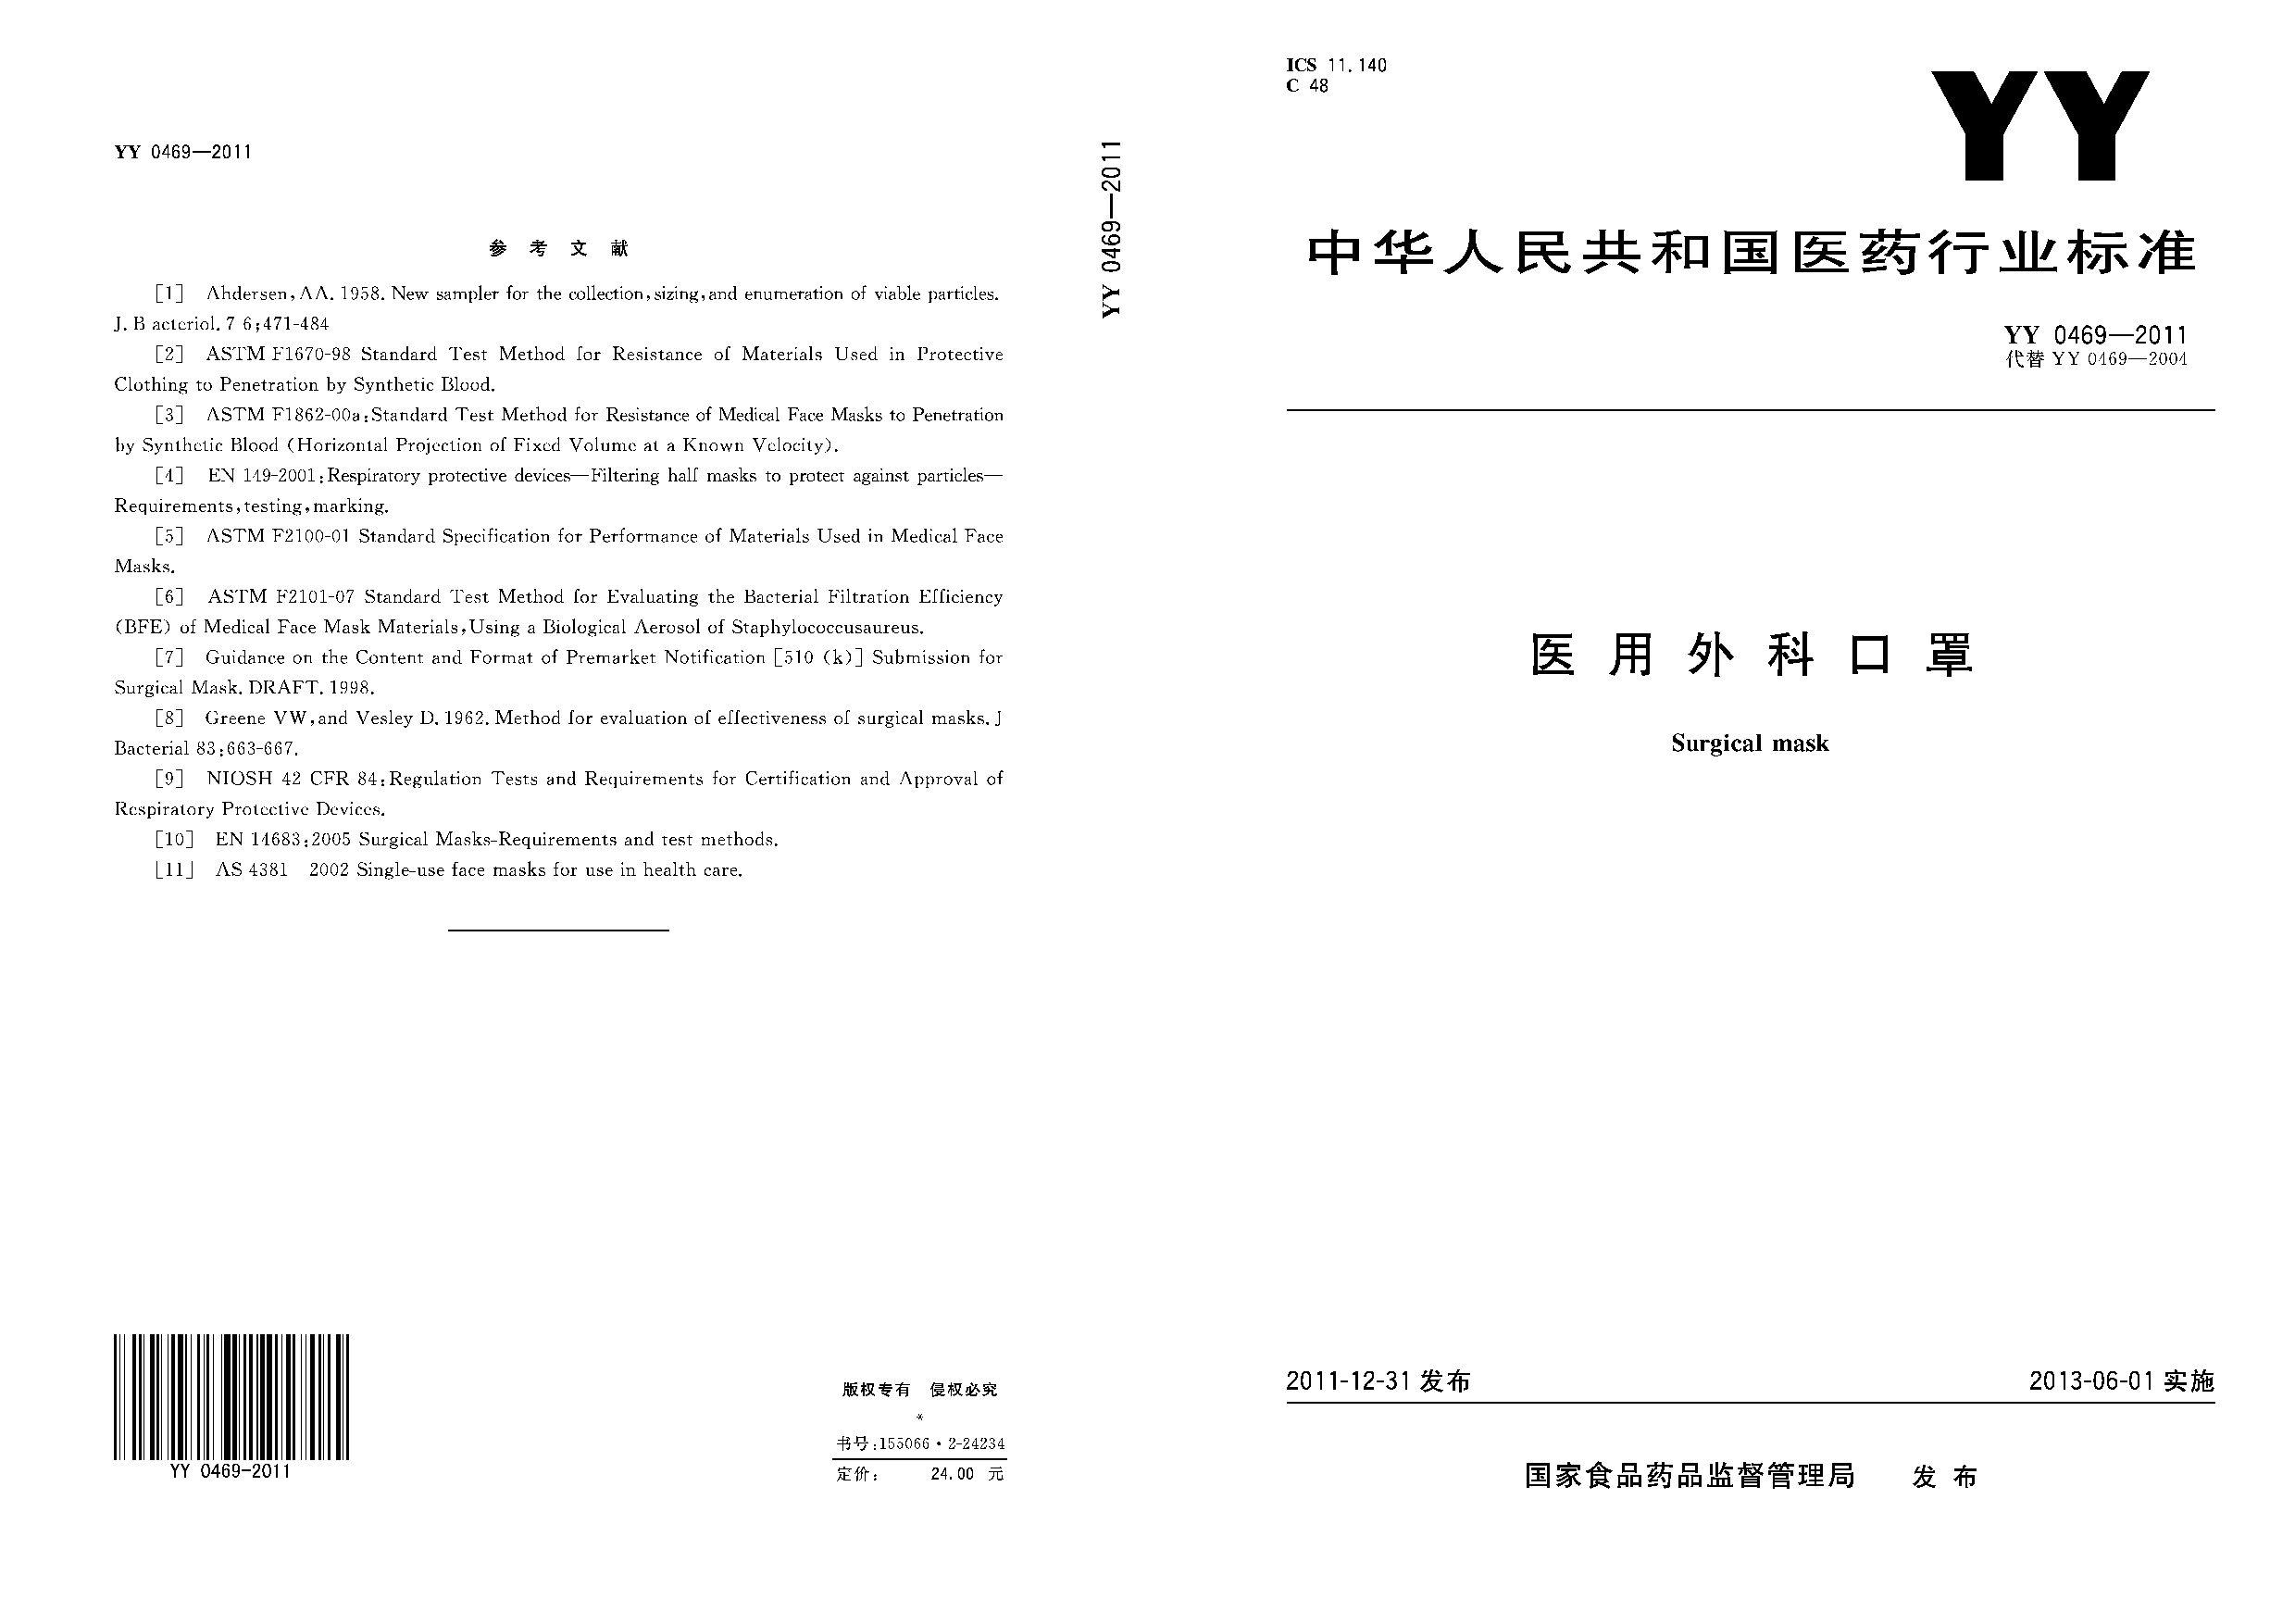 yy0469-2011 surgical mask